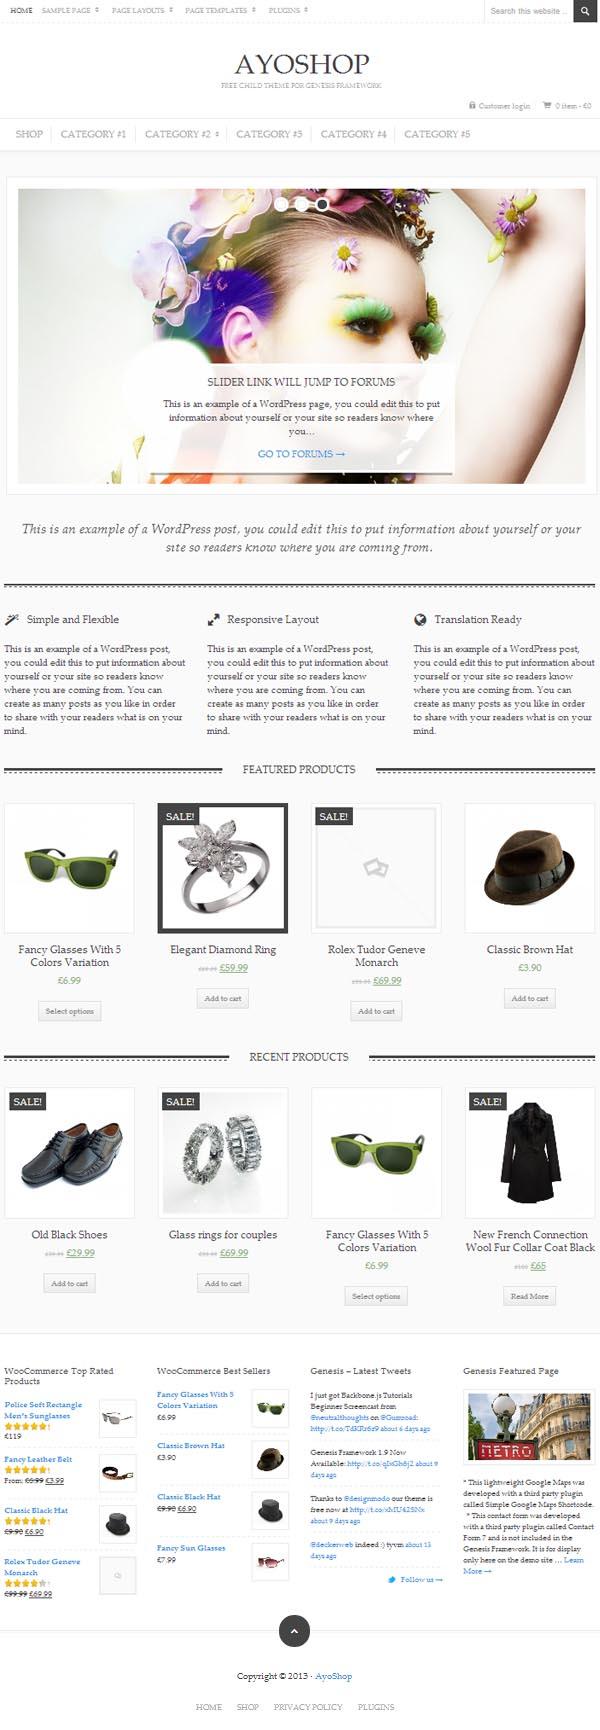 AyoShop Responsive eCommerce WordPress Themes - 4